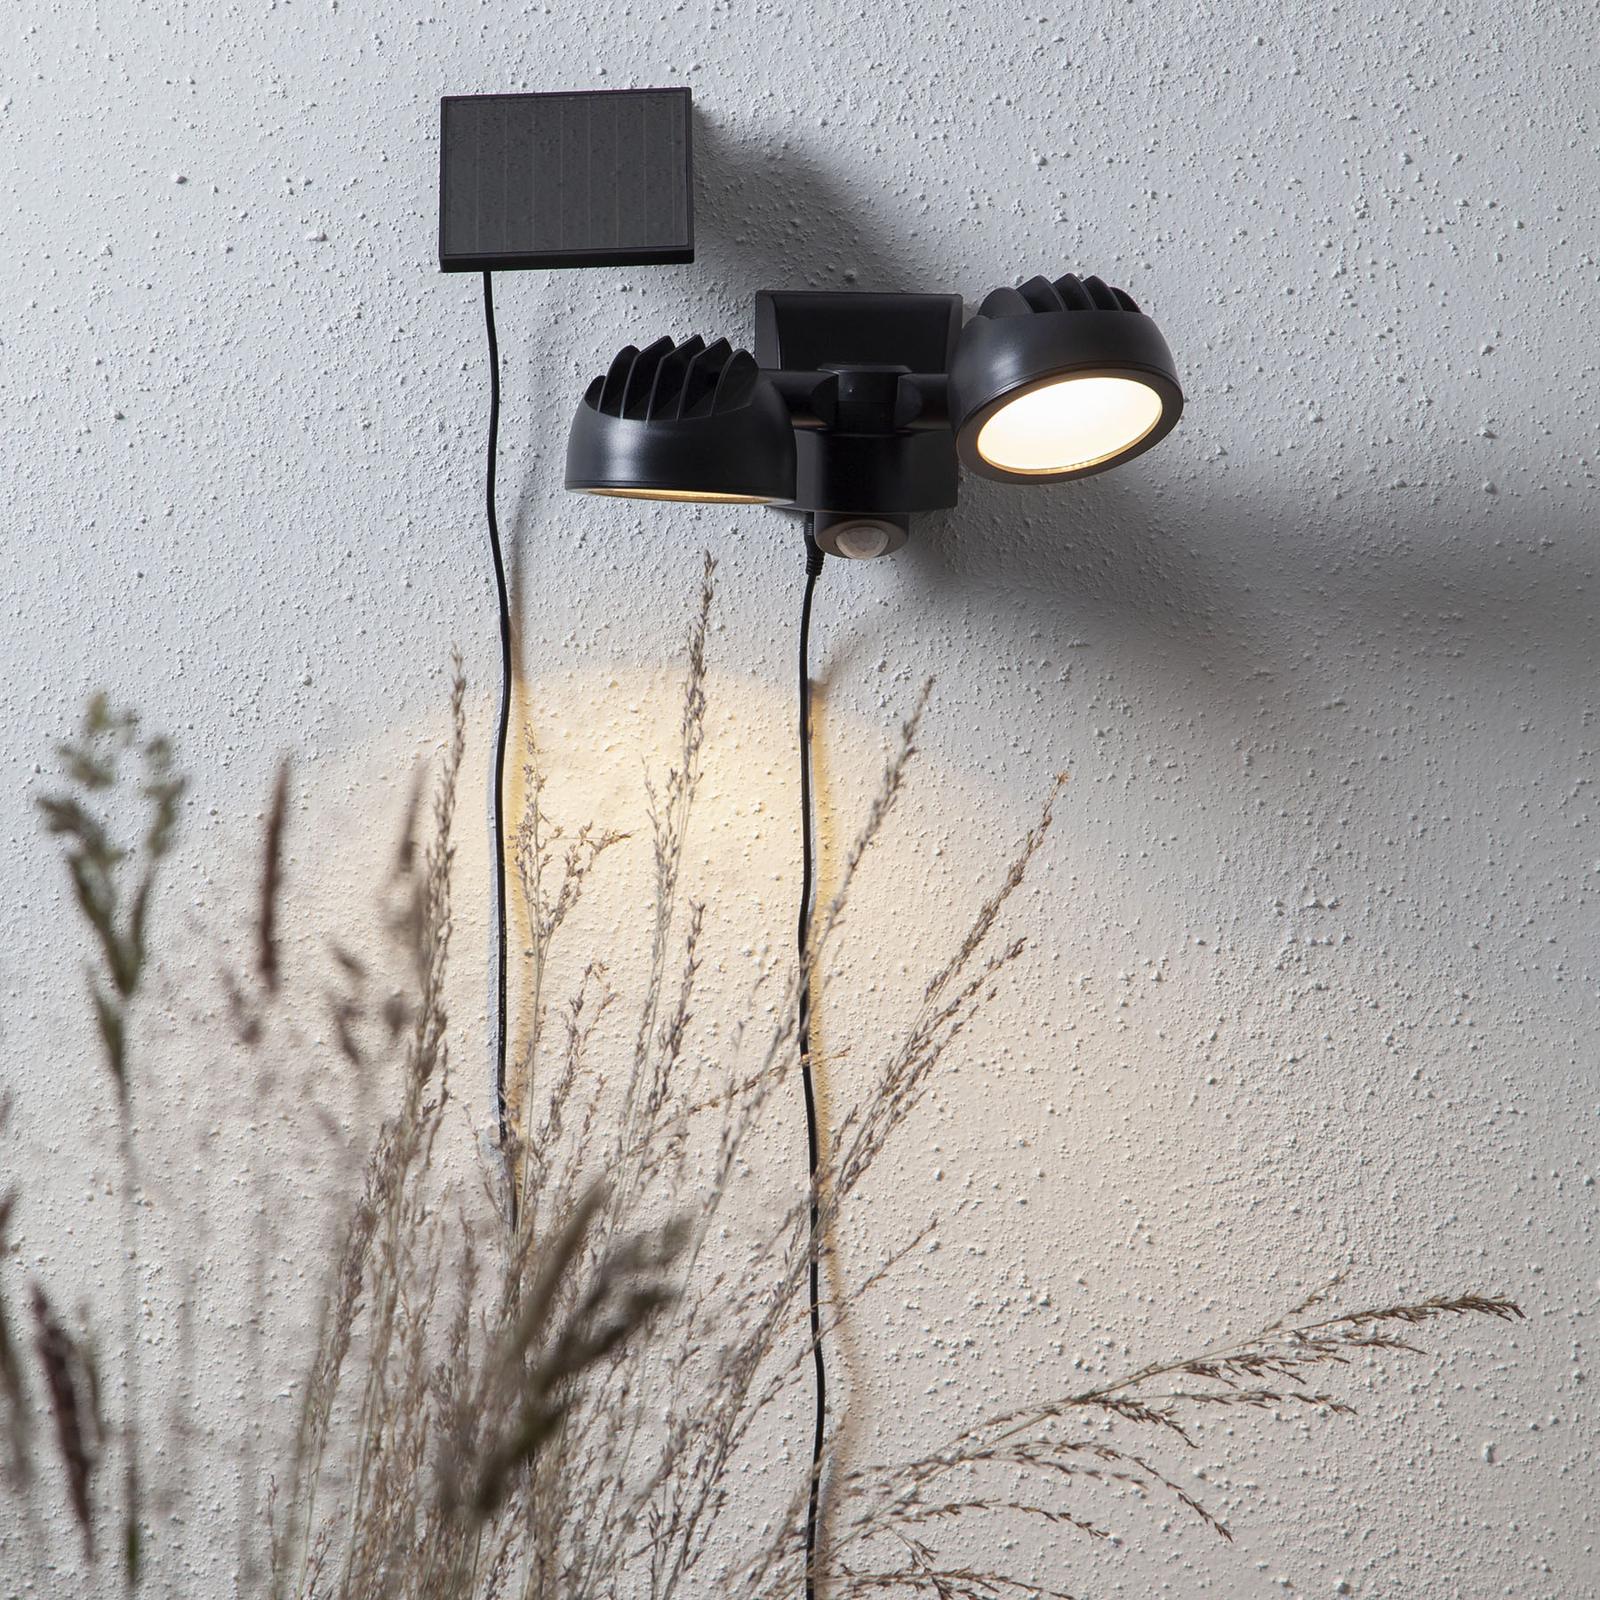 LED-solcellslampa Powerspot Sensor, 2 lampor